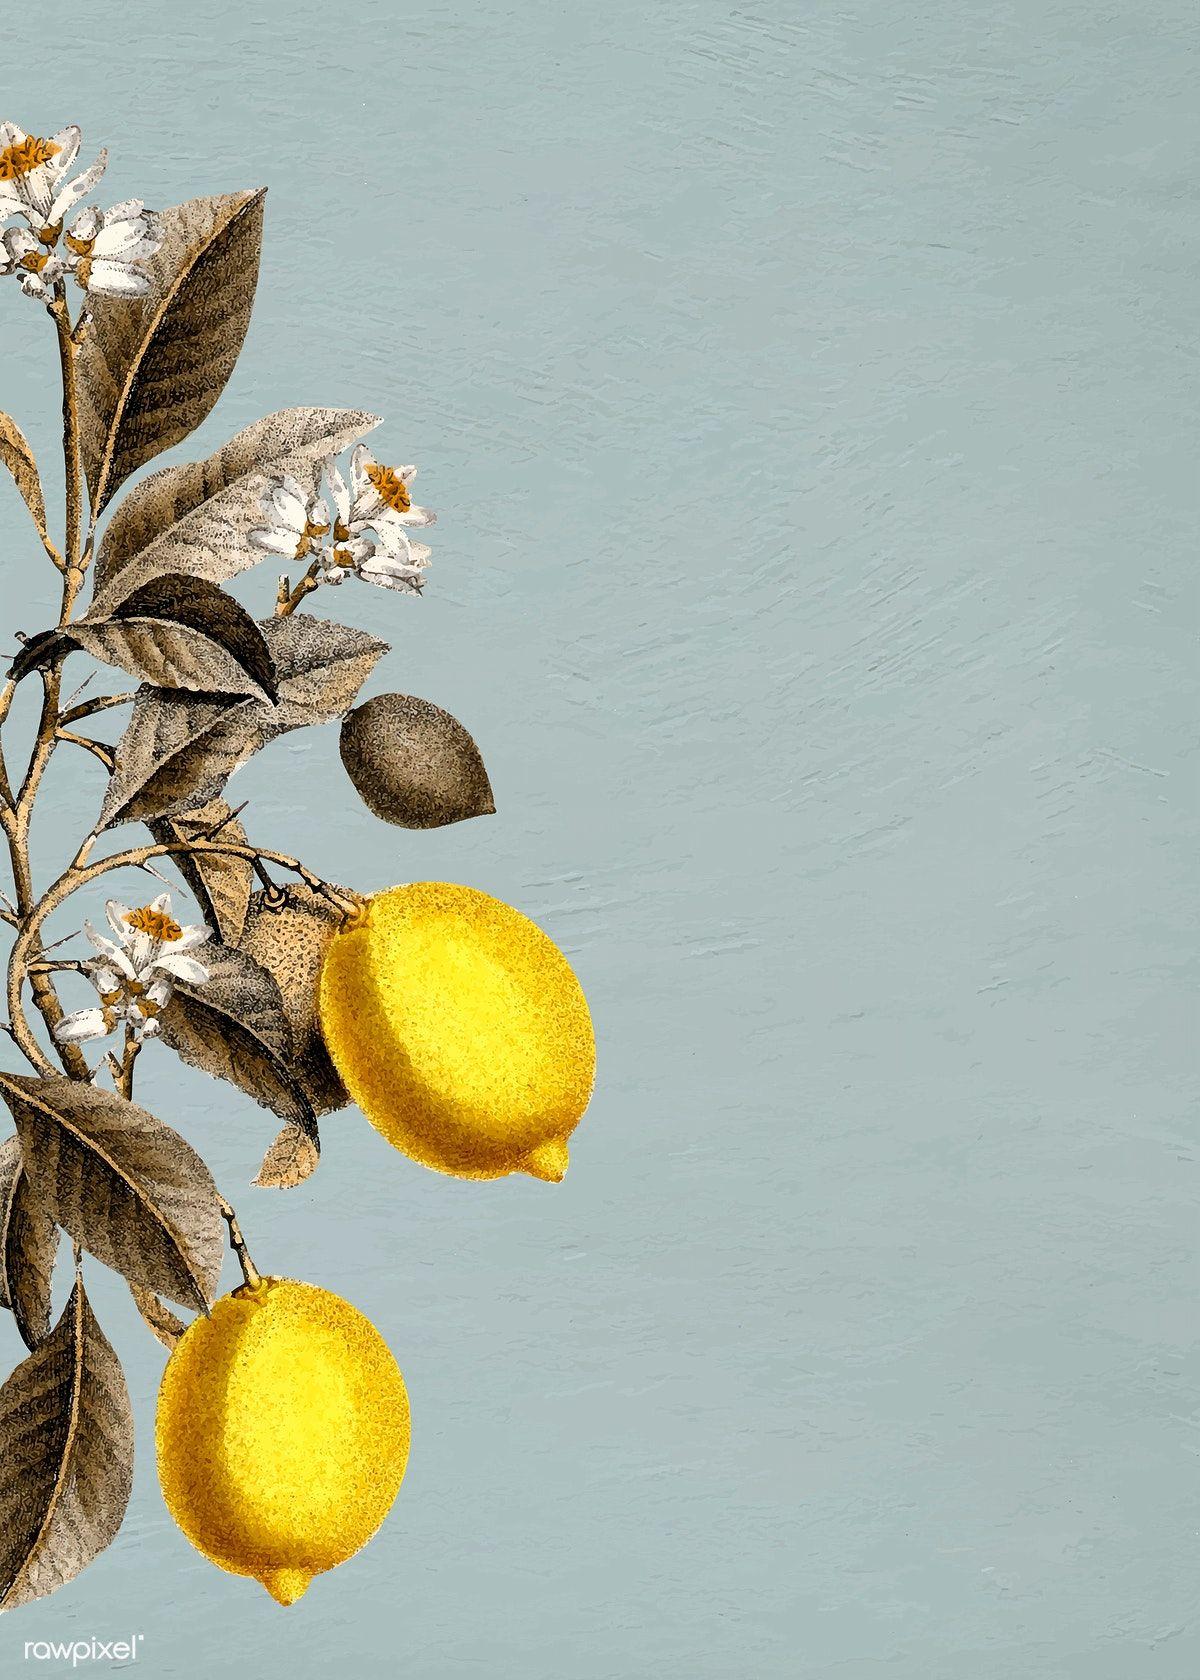 Download premium illustration of Tropical lemon on a blue